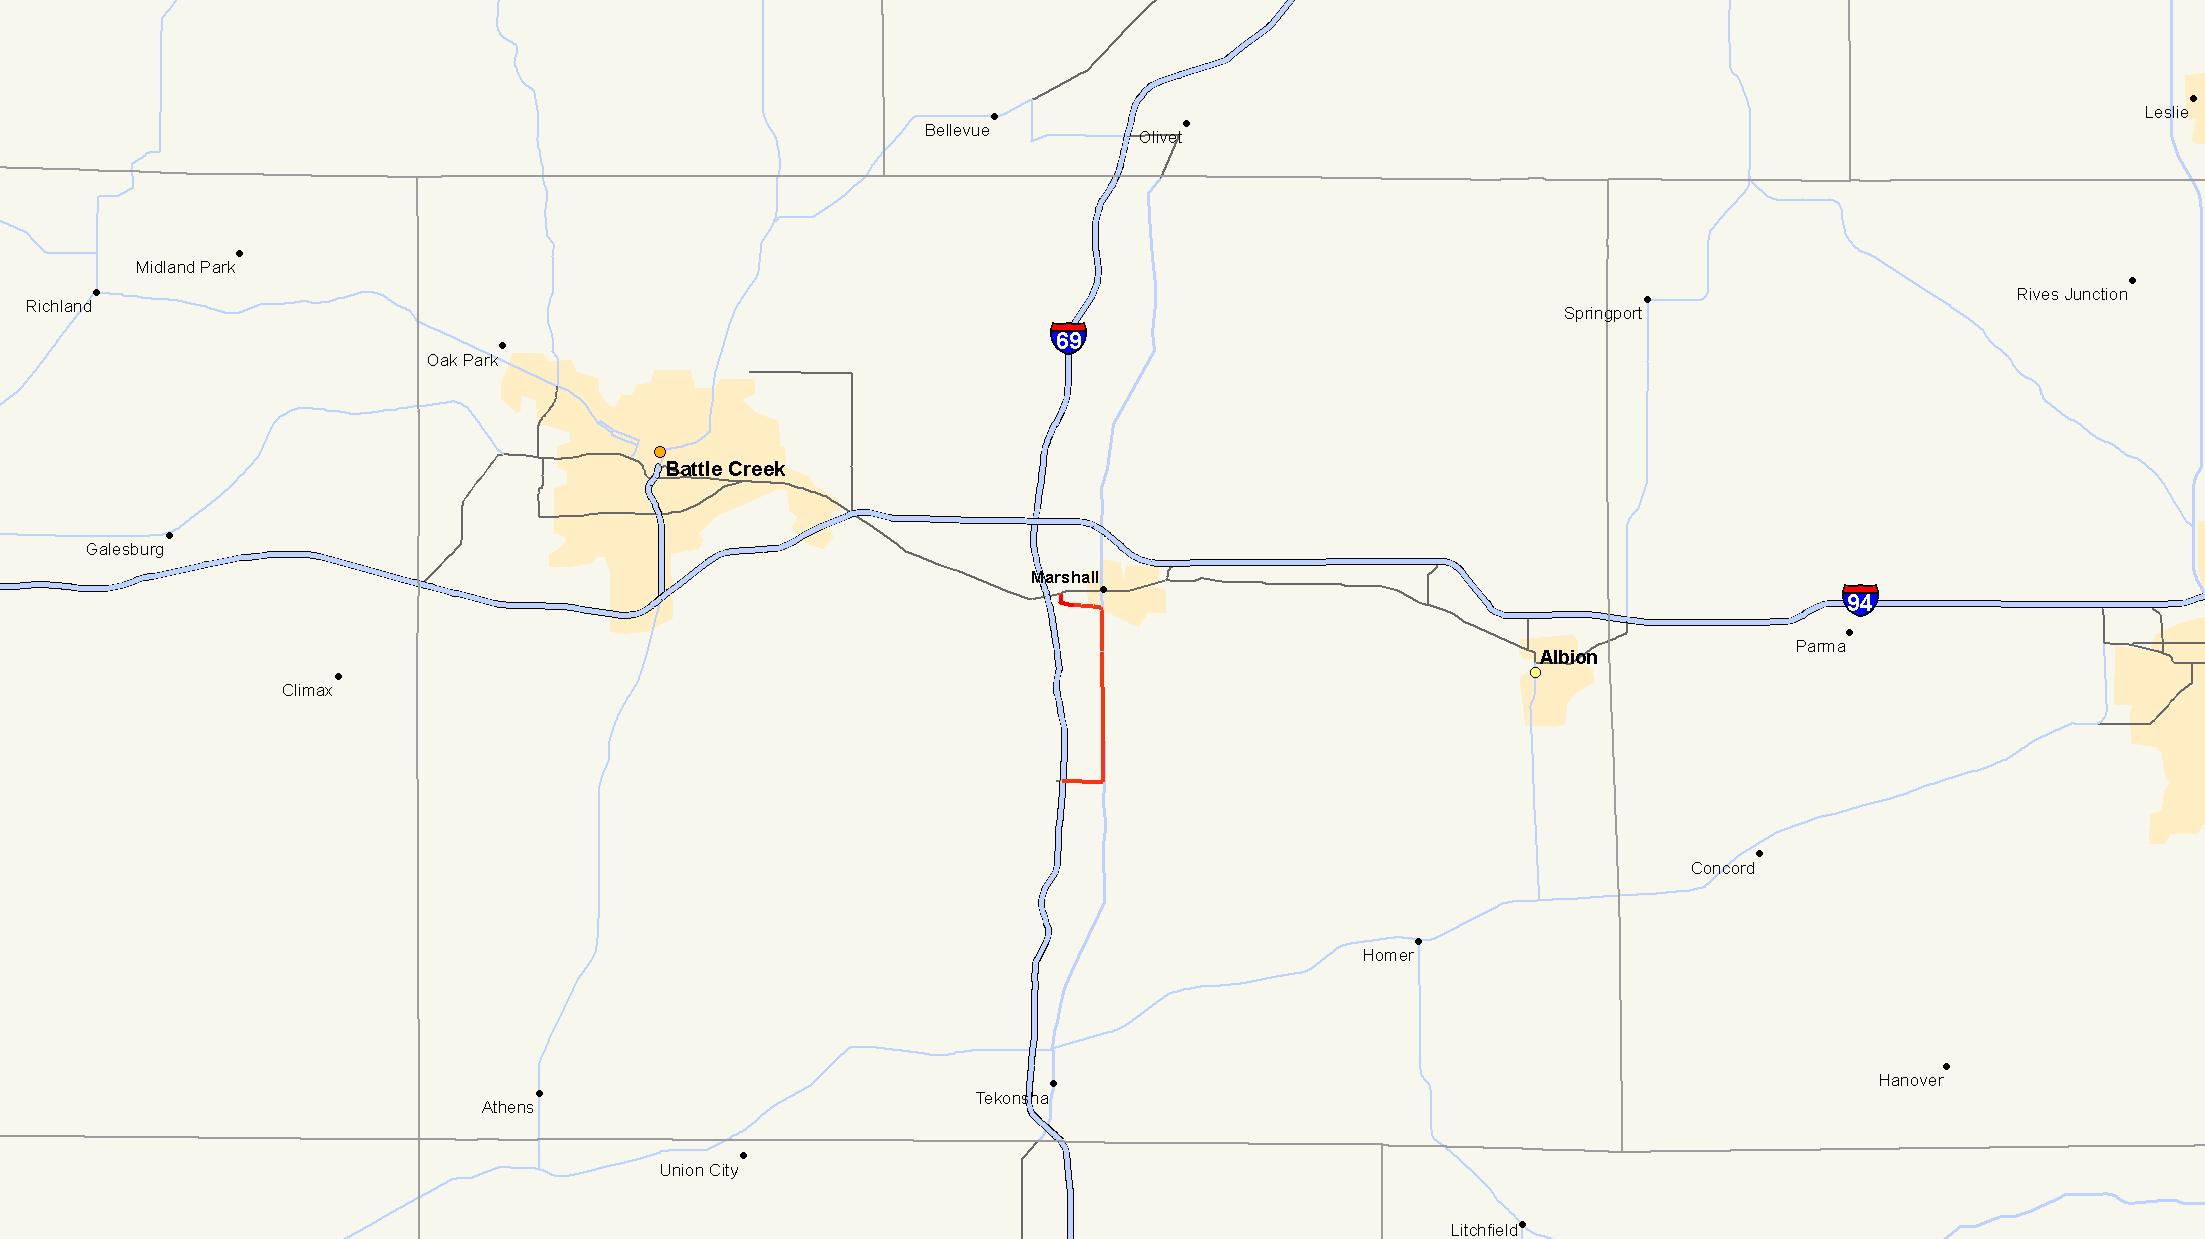 Concord Michigan Map.M 227 Michigan Highway Wikipedia